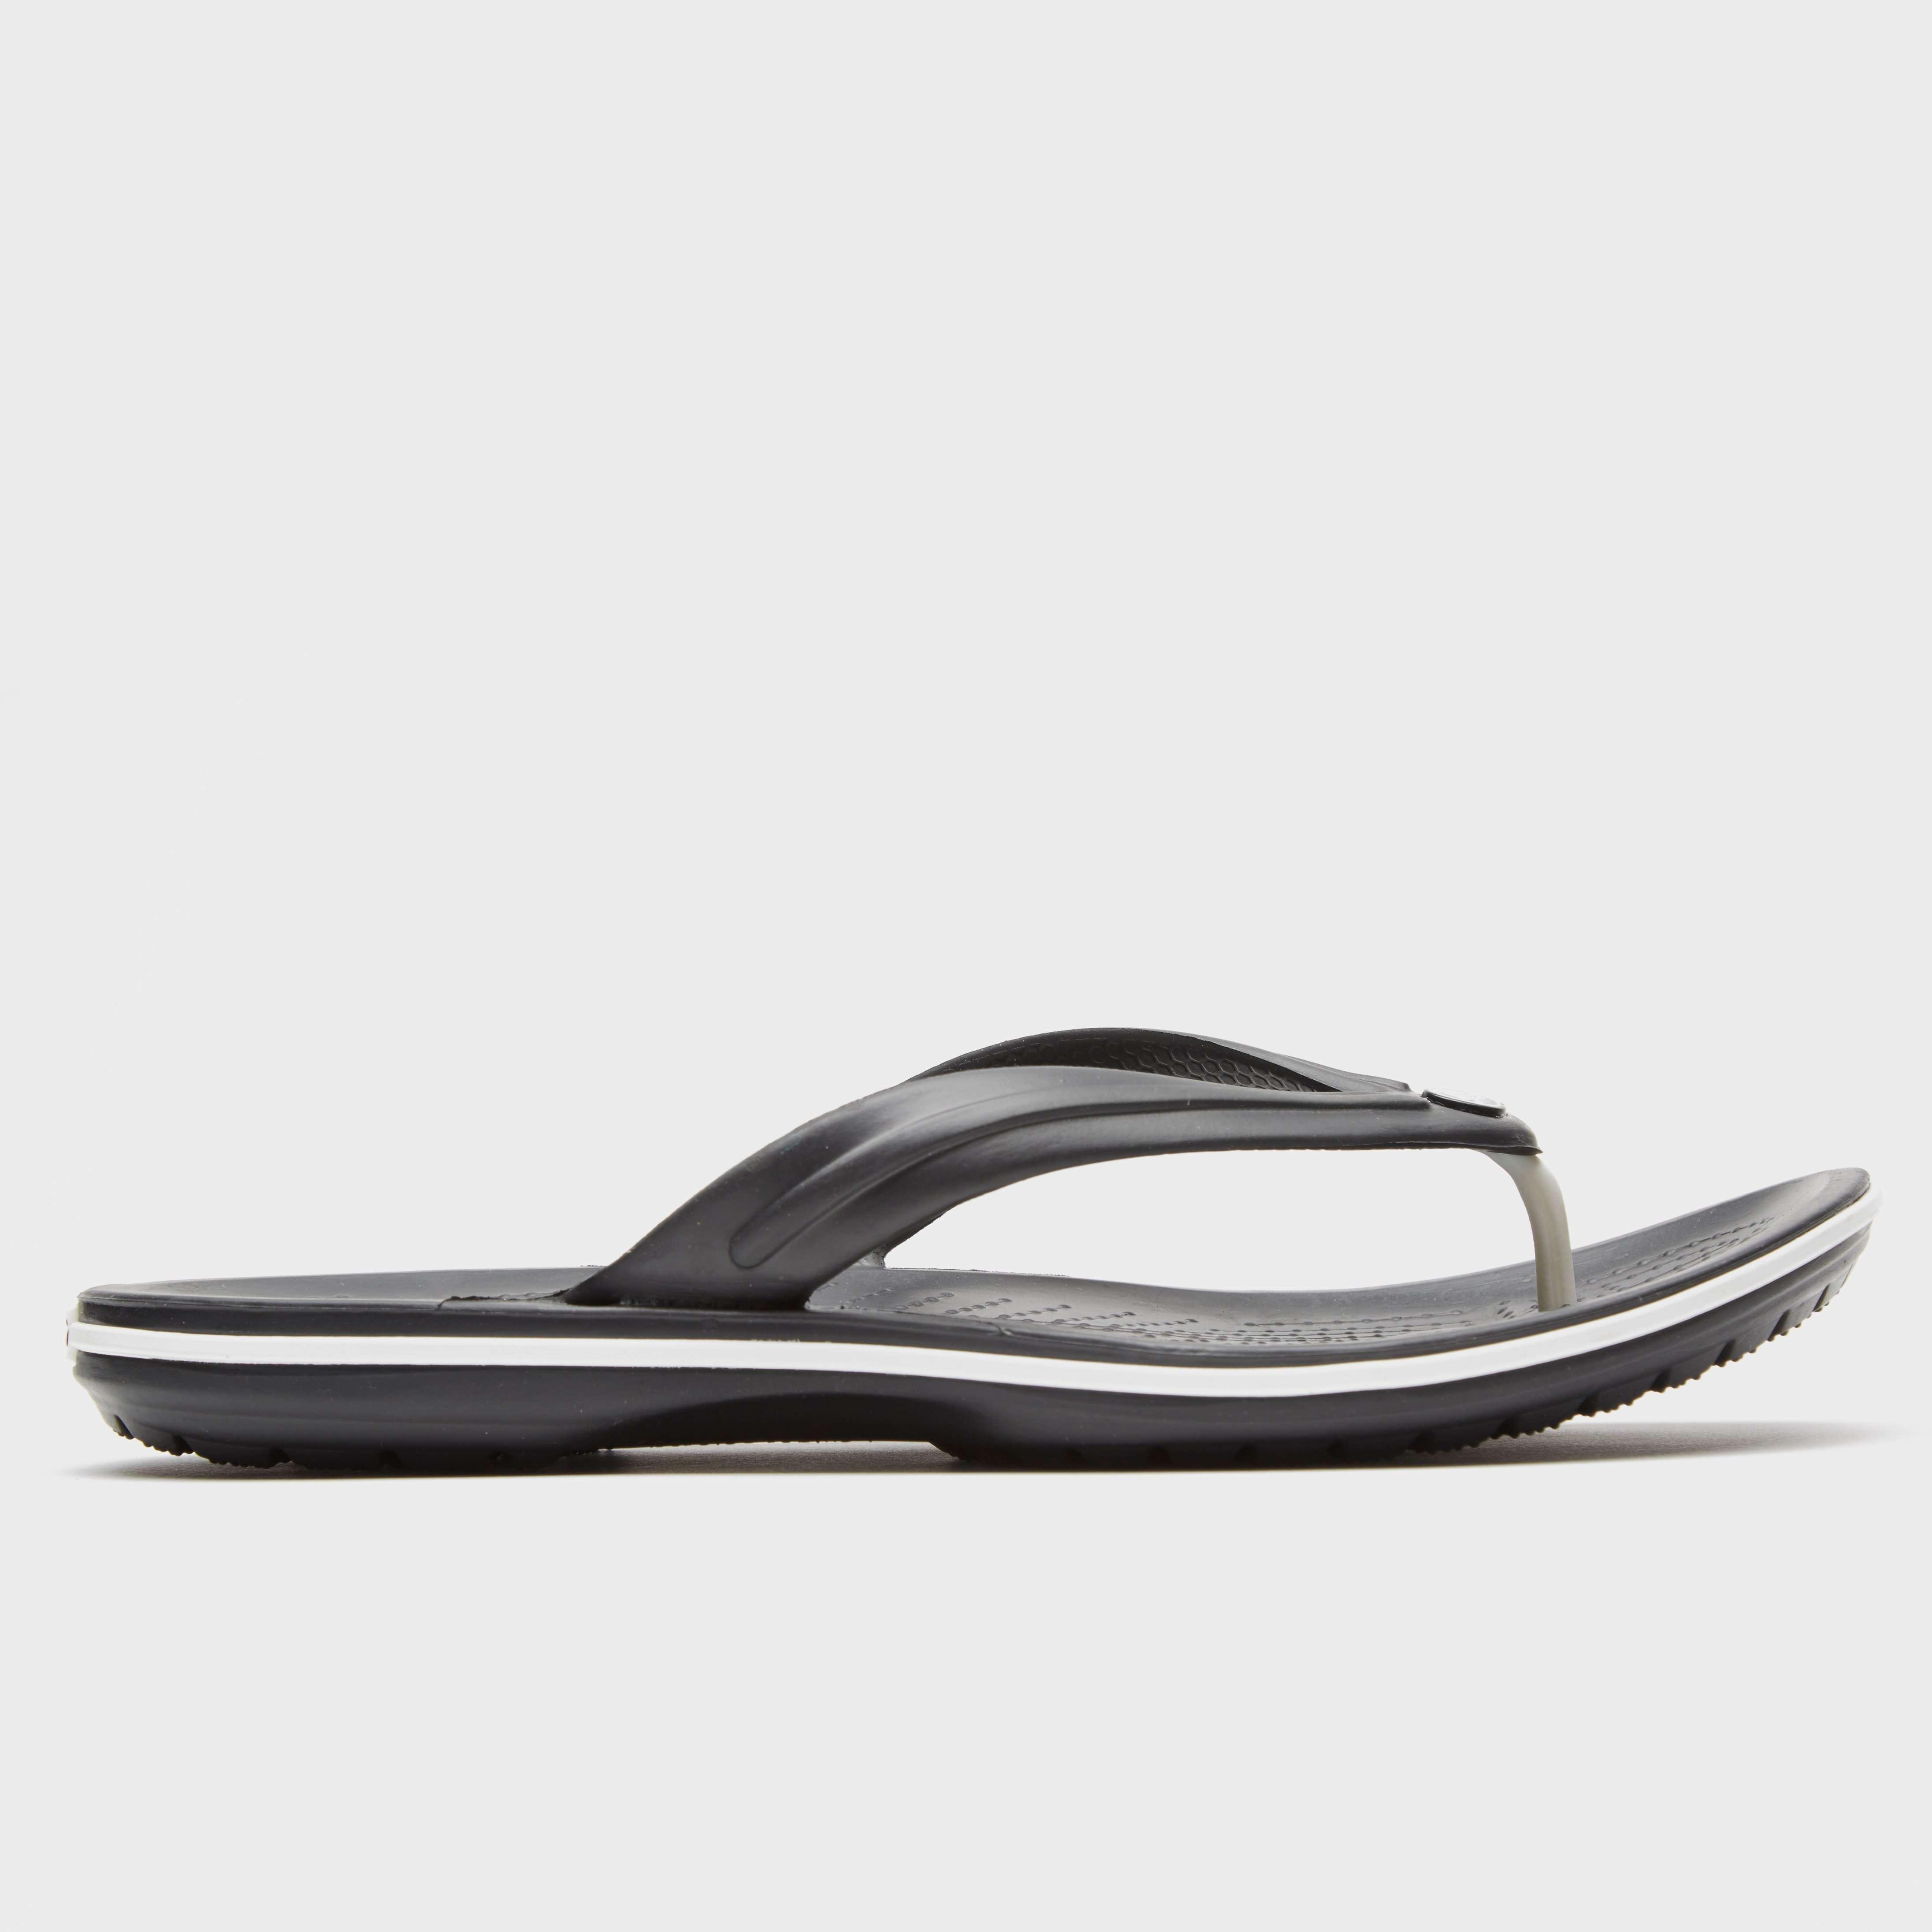 CROCS Unisex Crocband Flip-Flops